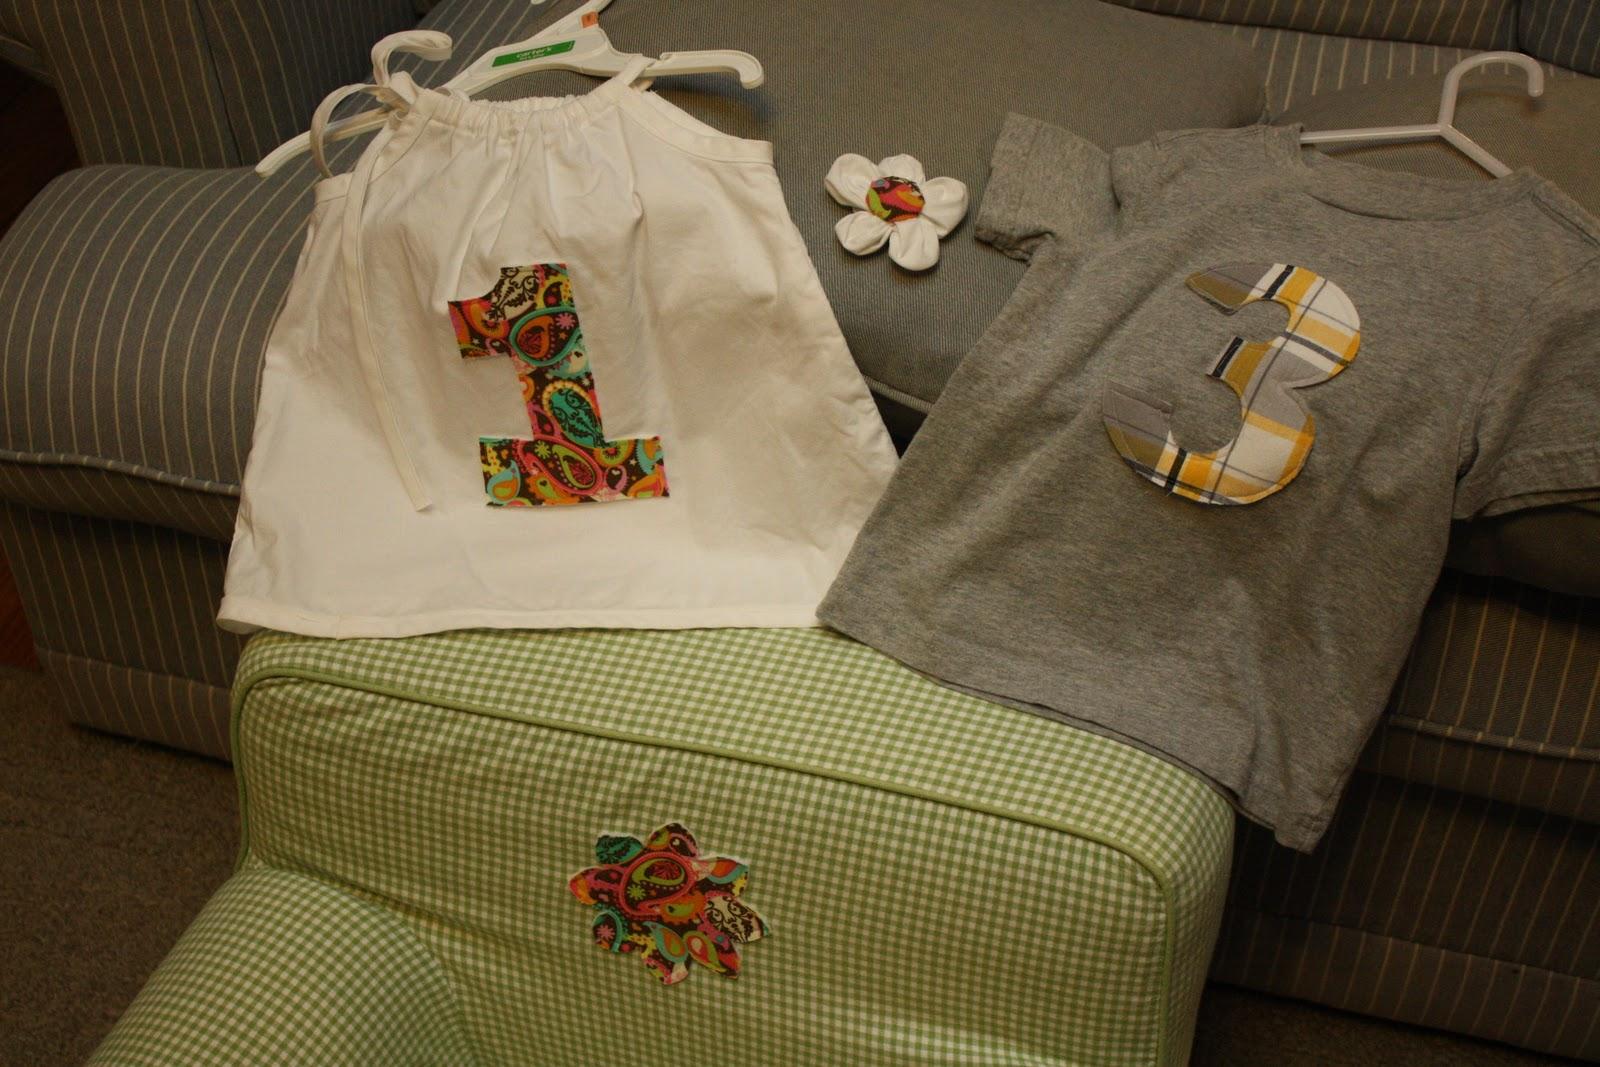 The Ballard Family Make Your Own Birthday Shirt